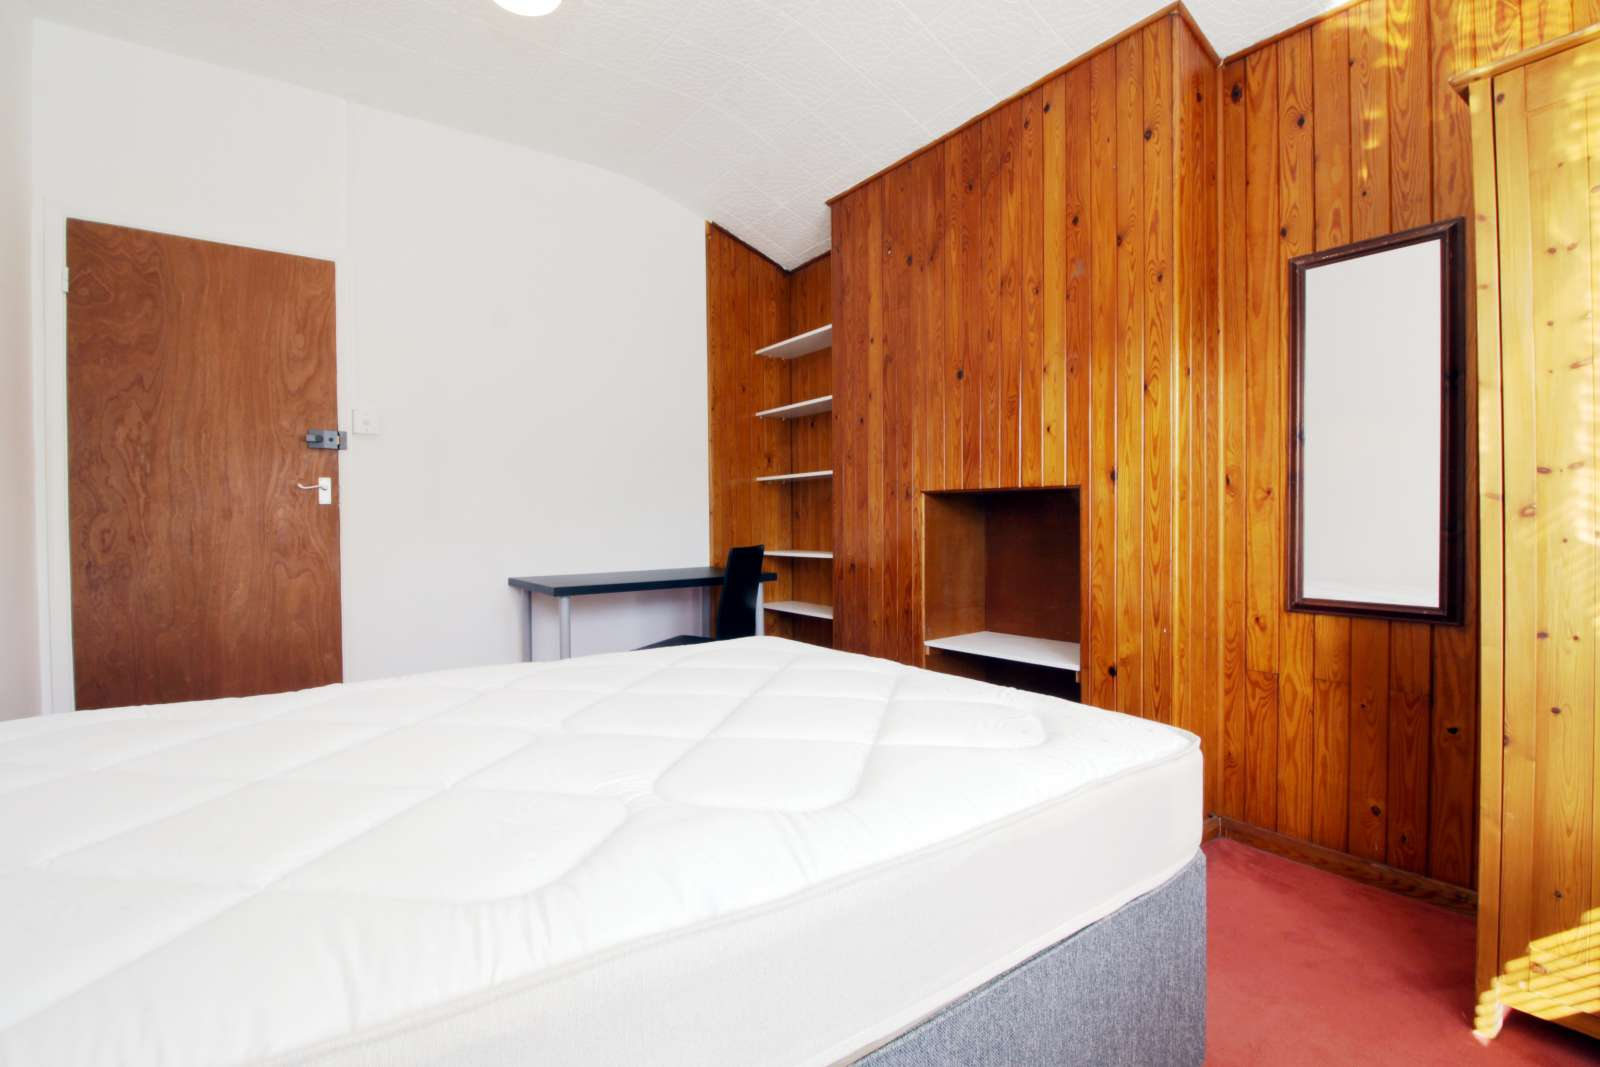 Rent Room Letchworth